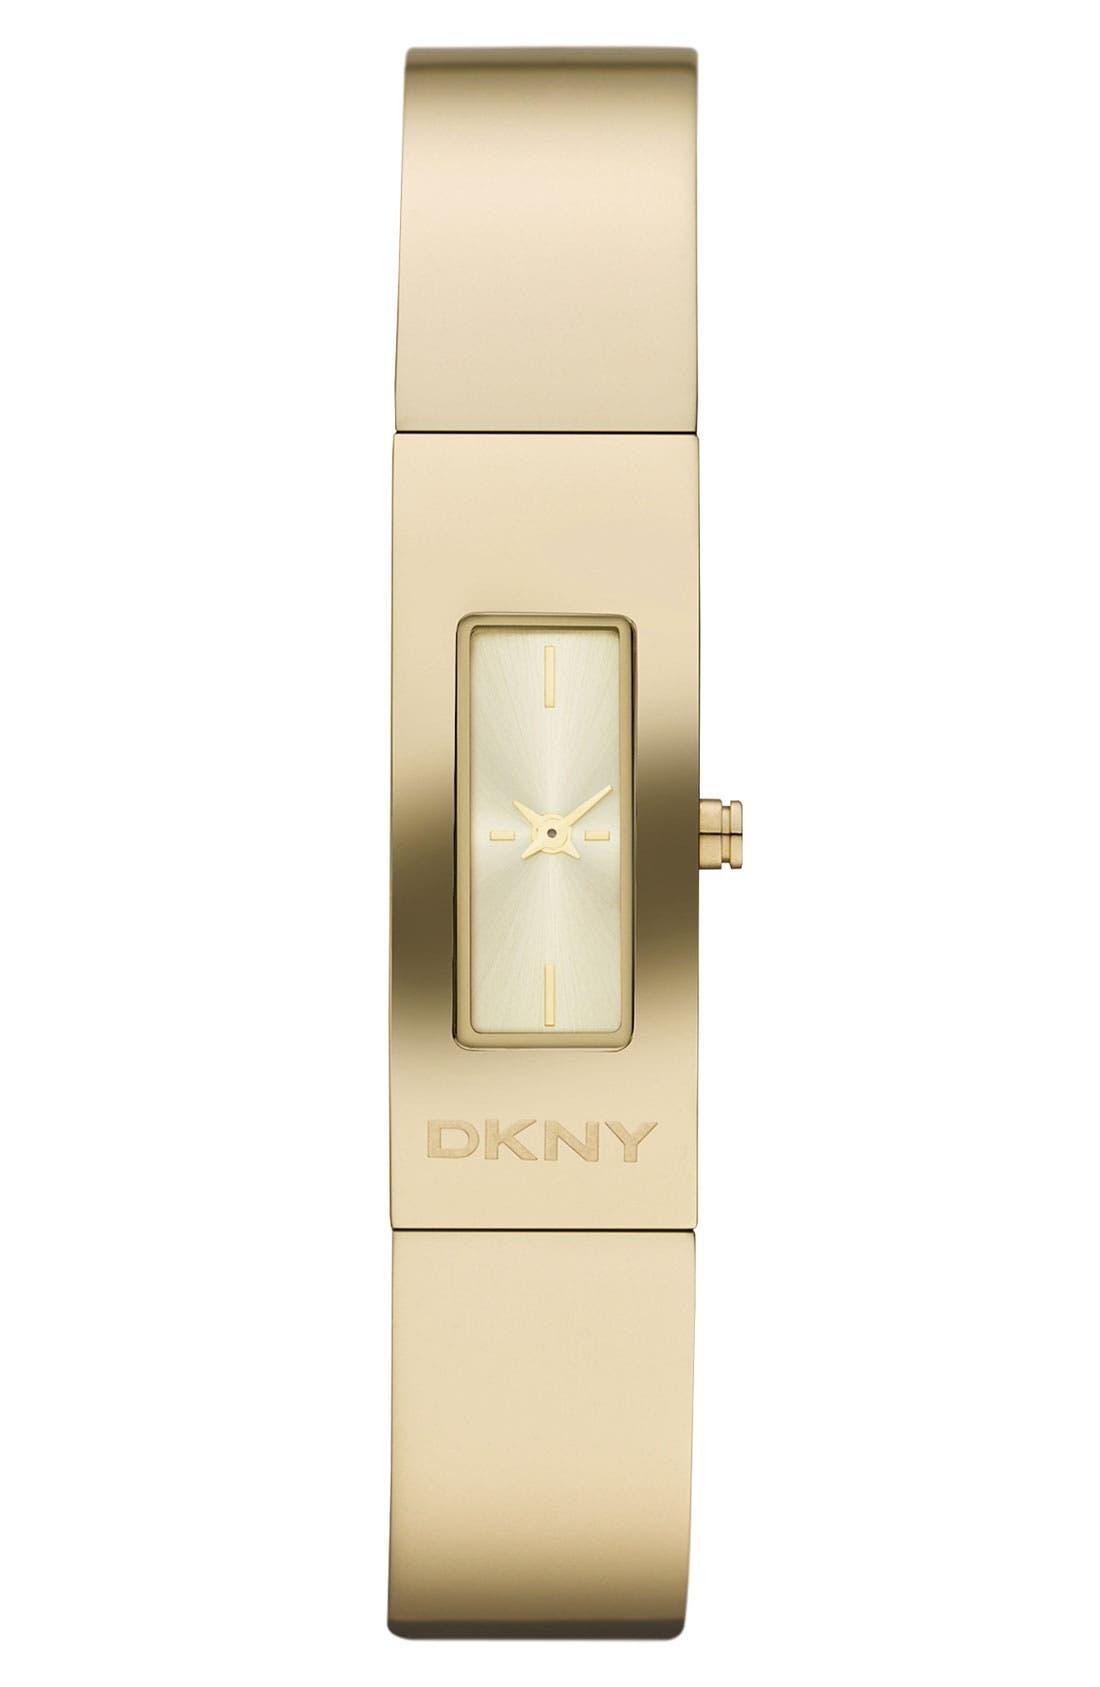 Main Image - DKNY 'Beekman' Logo Bangle Watch, 13mm x 33mm